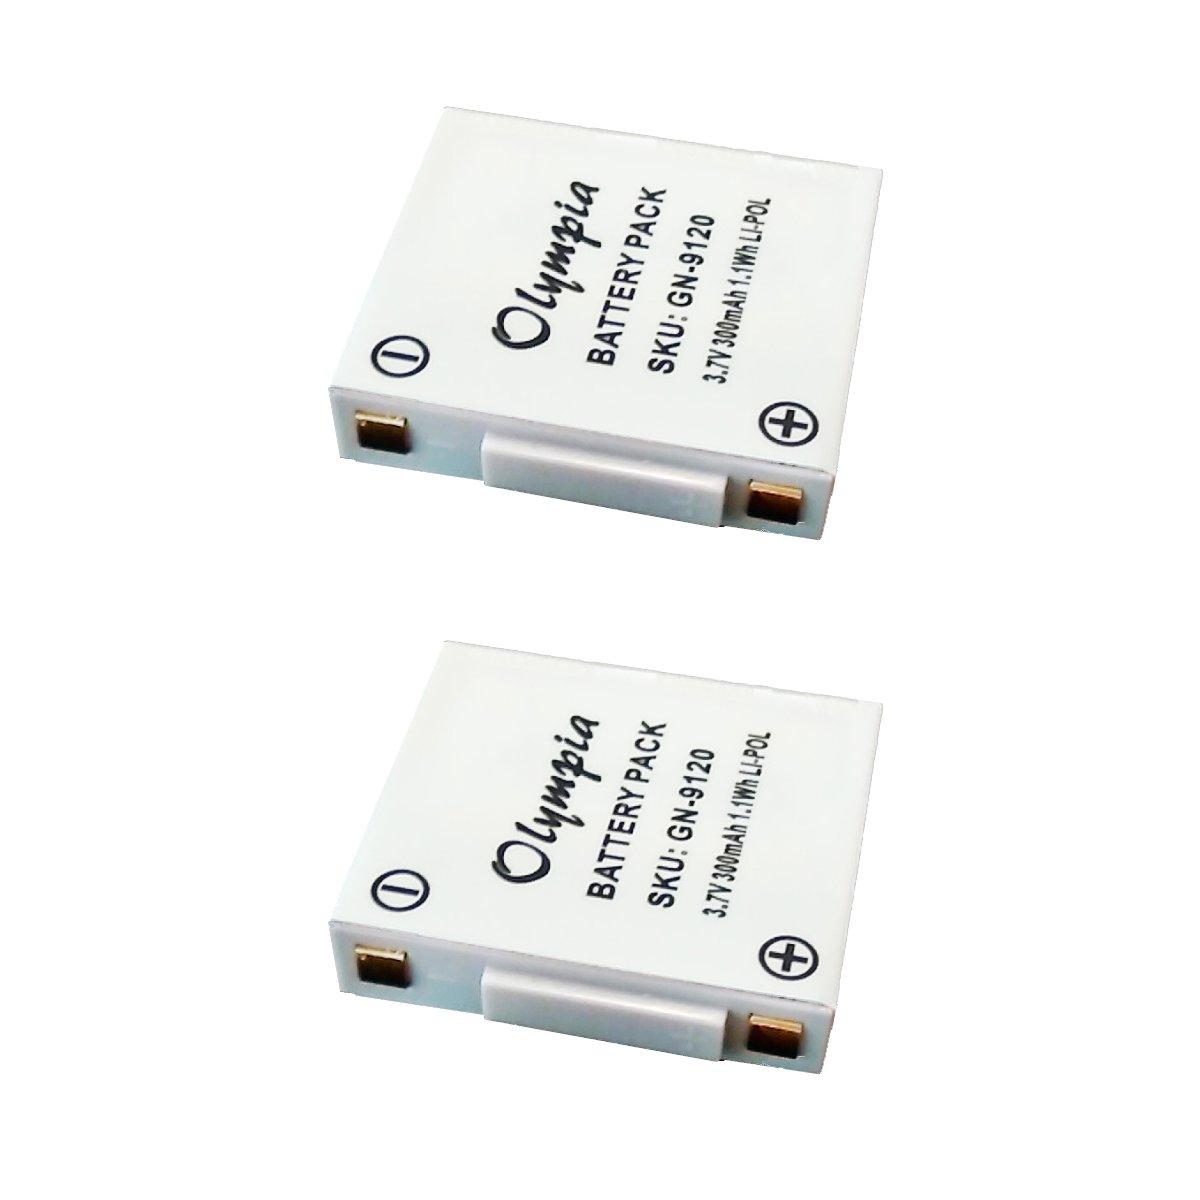 7d83cd14196 Amazon.com: 2 Pack of Jabra AHB602823 Battery - Replacement Battery for  Jabra Wireless Headset (300mAh, 3.7V, Li-Pol): Electronics